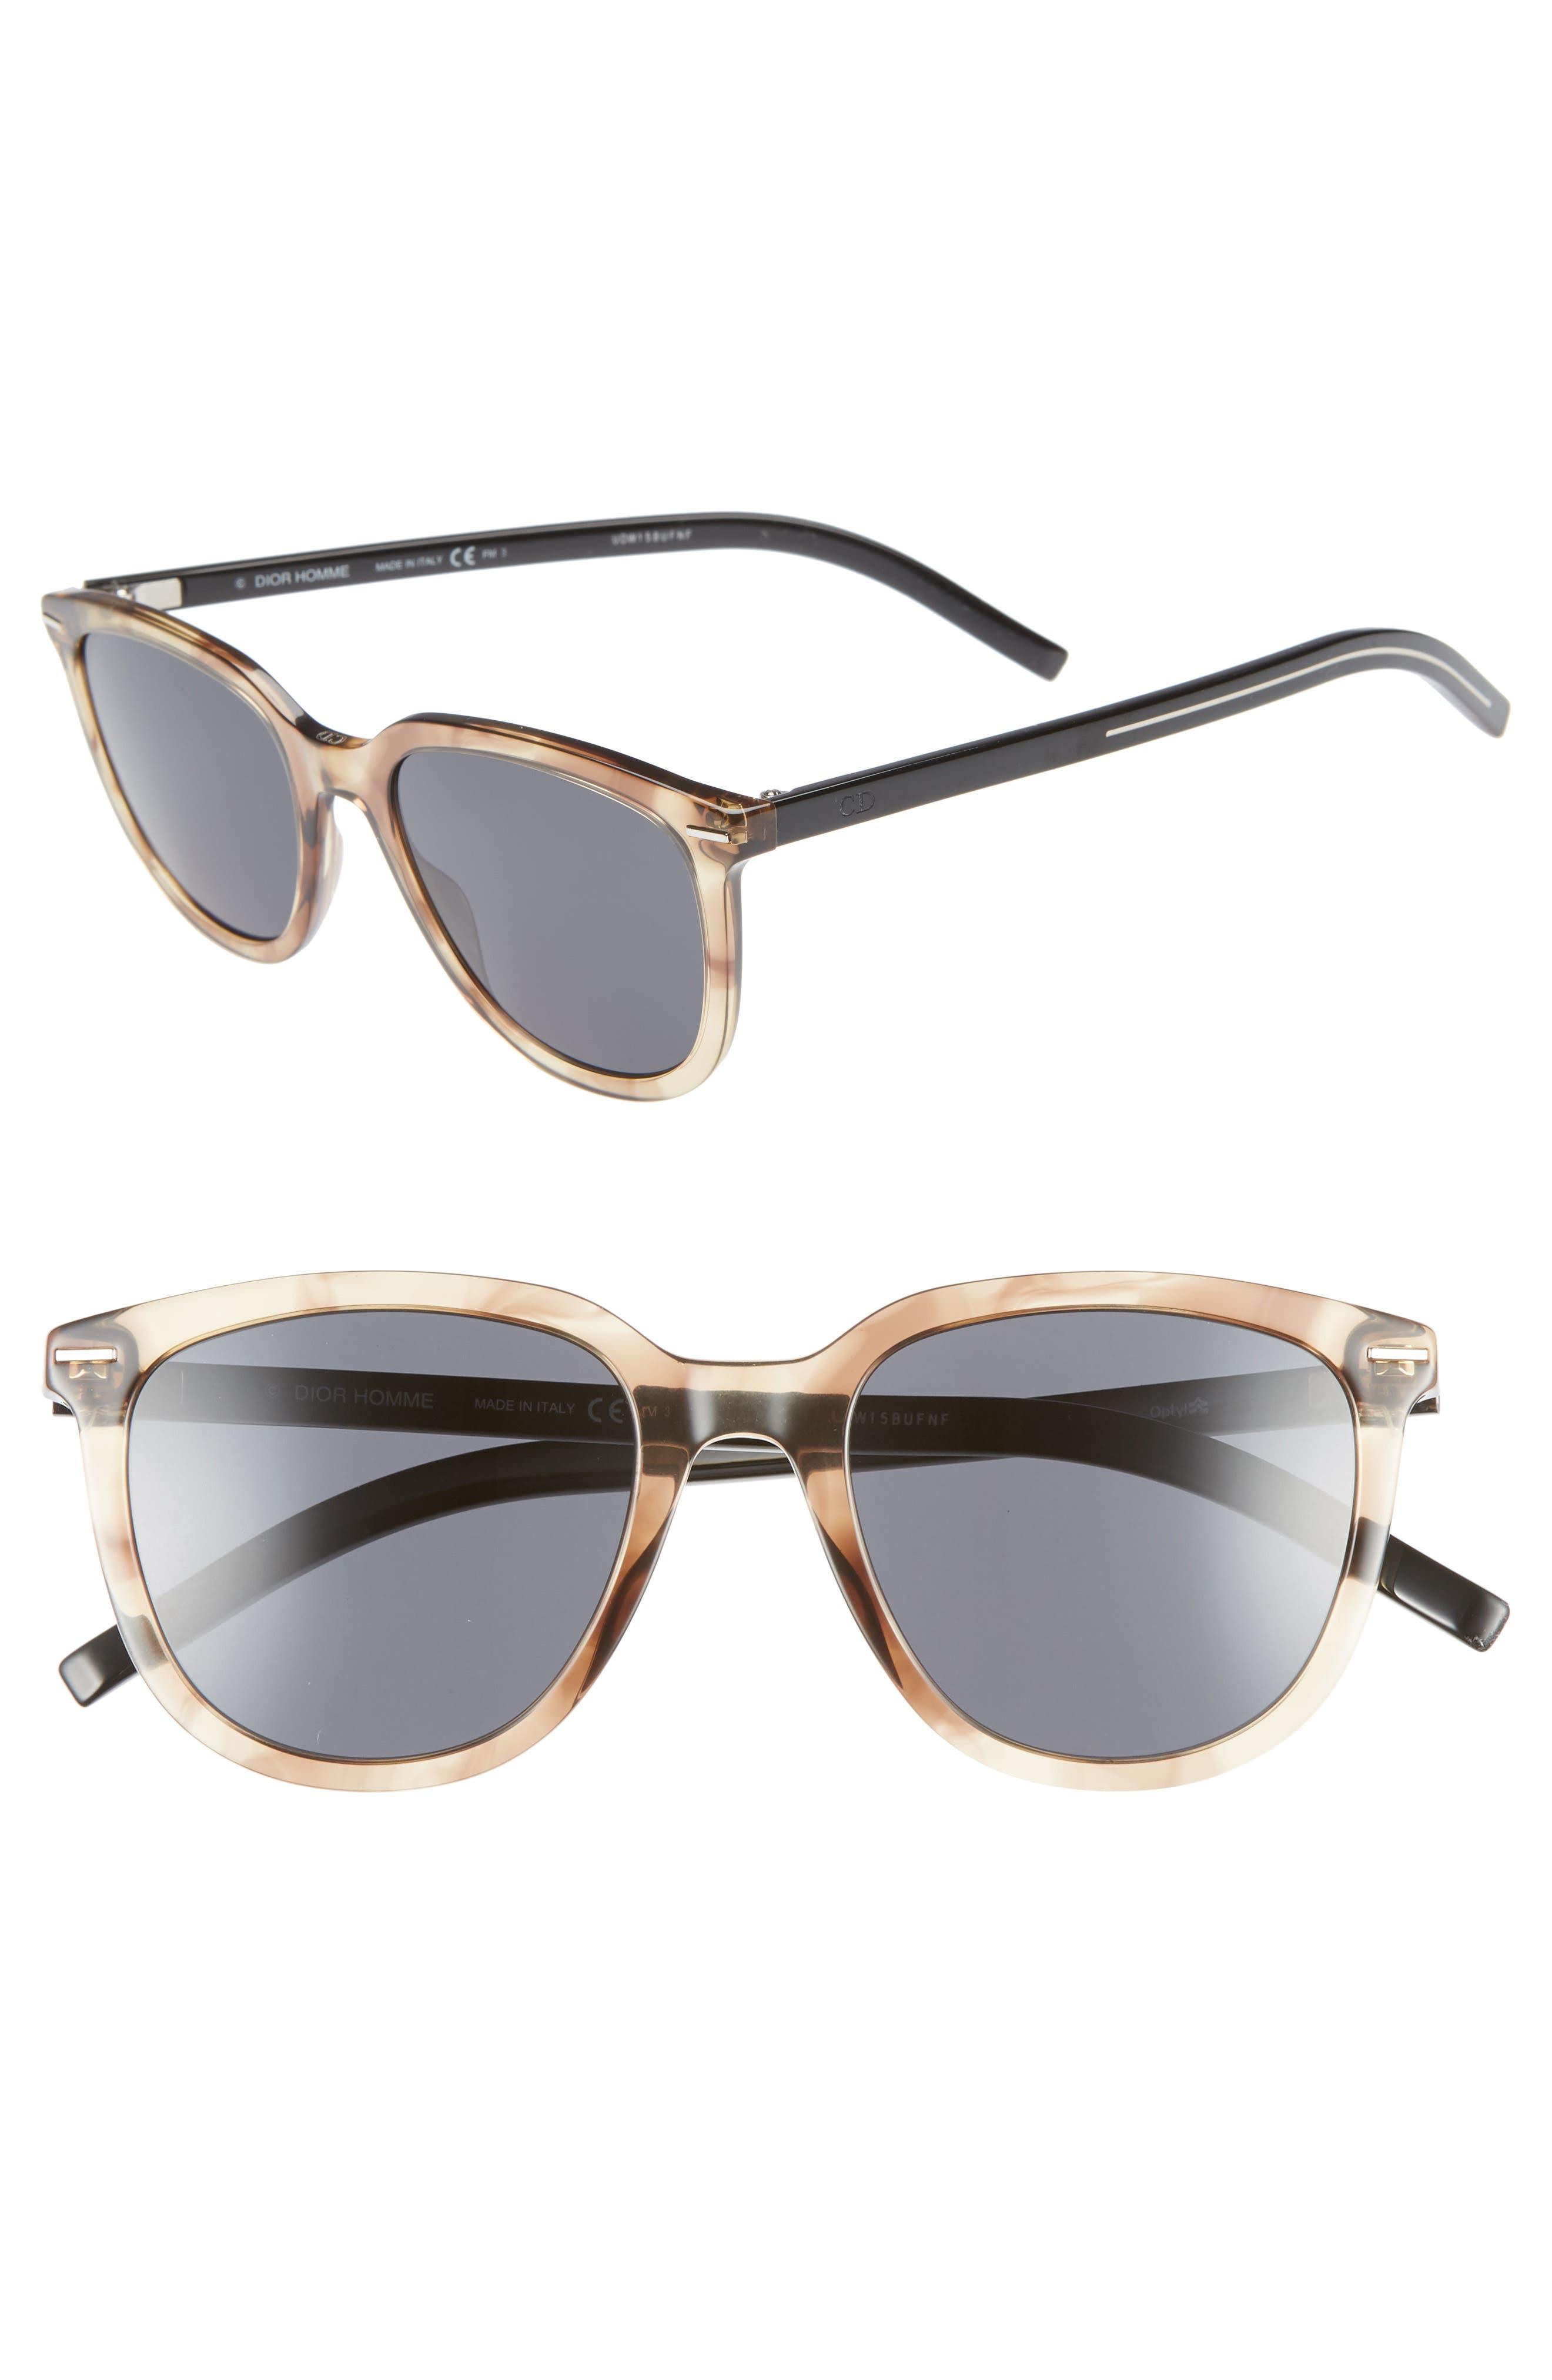 50a876b1df800 Men s Dior Sunglasses   Eyeglasses